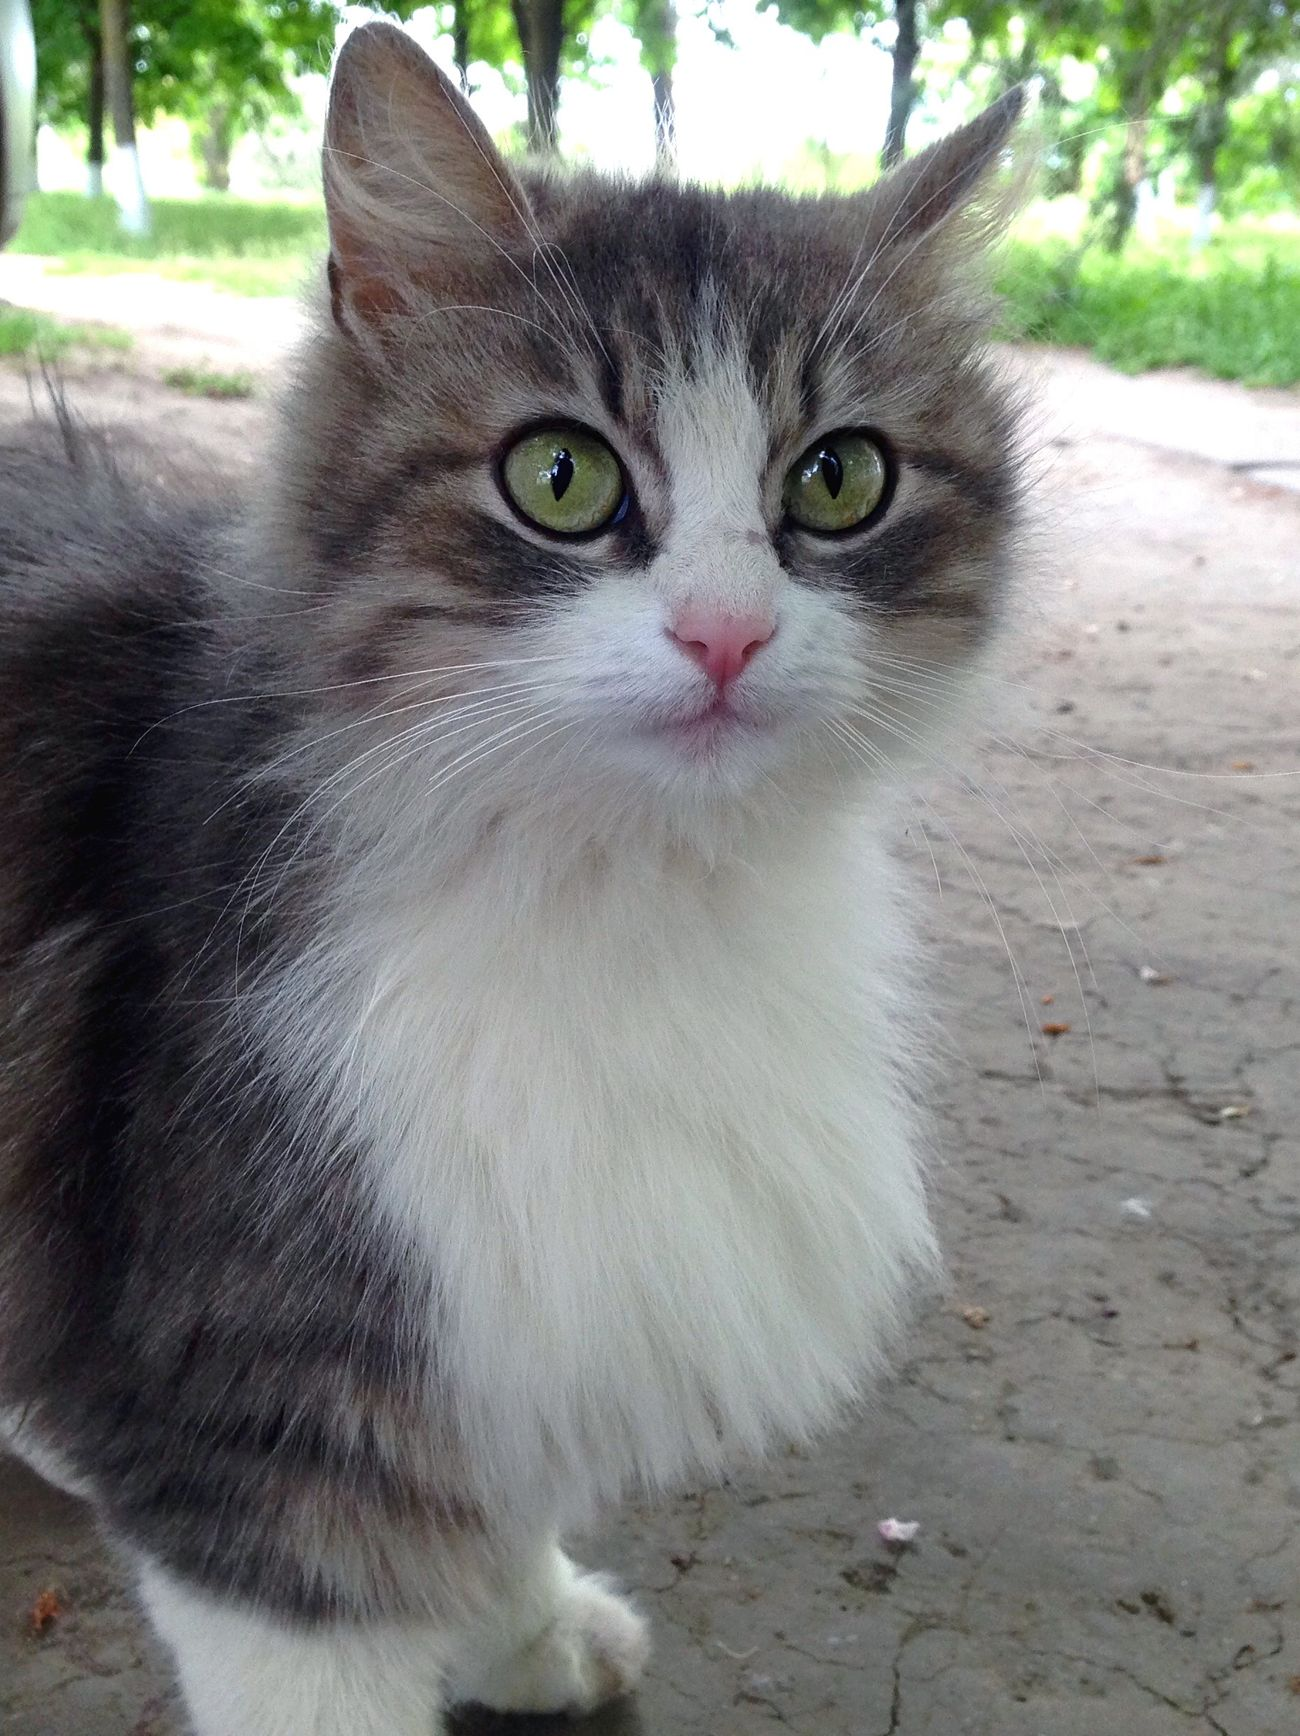 Cats 🐱 Cats Of EyeEm Cat♡ Cats Cat Cat Lovers Homeless Cats Коты Котик котэ кот